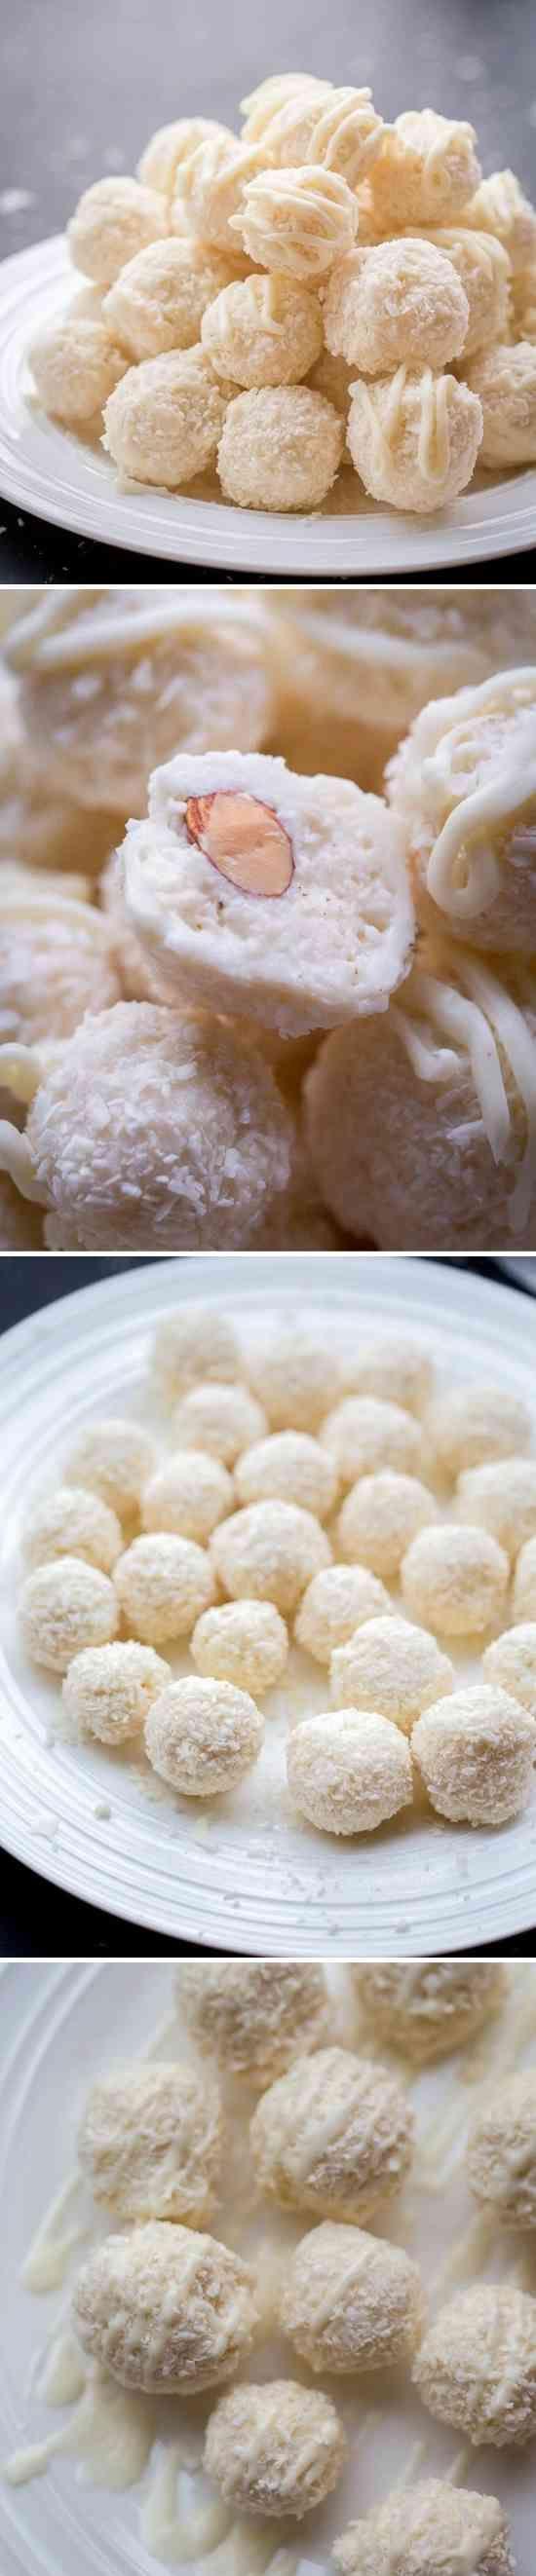 White Chocolate Coconut Candy (Raffaello Copycat) - cake, candy, chip, coconut, dessert, recipes, white chocolate